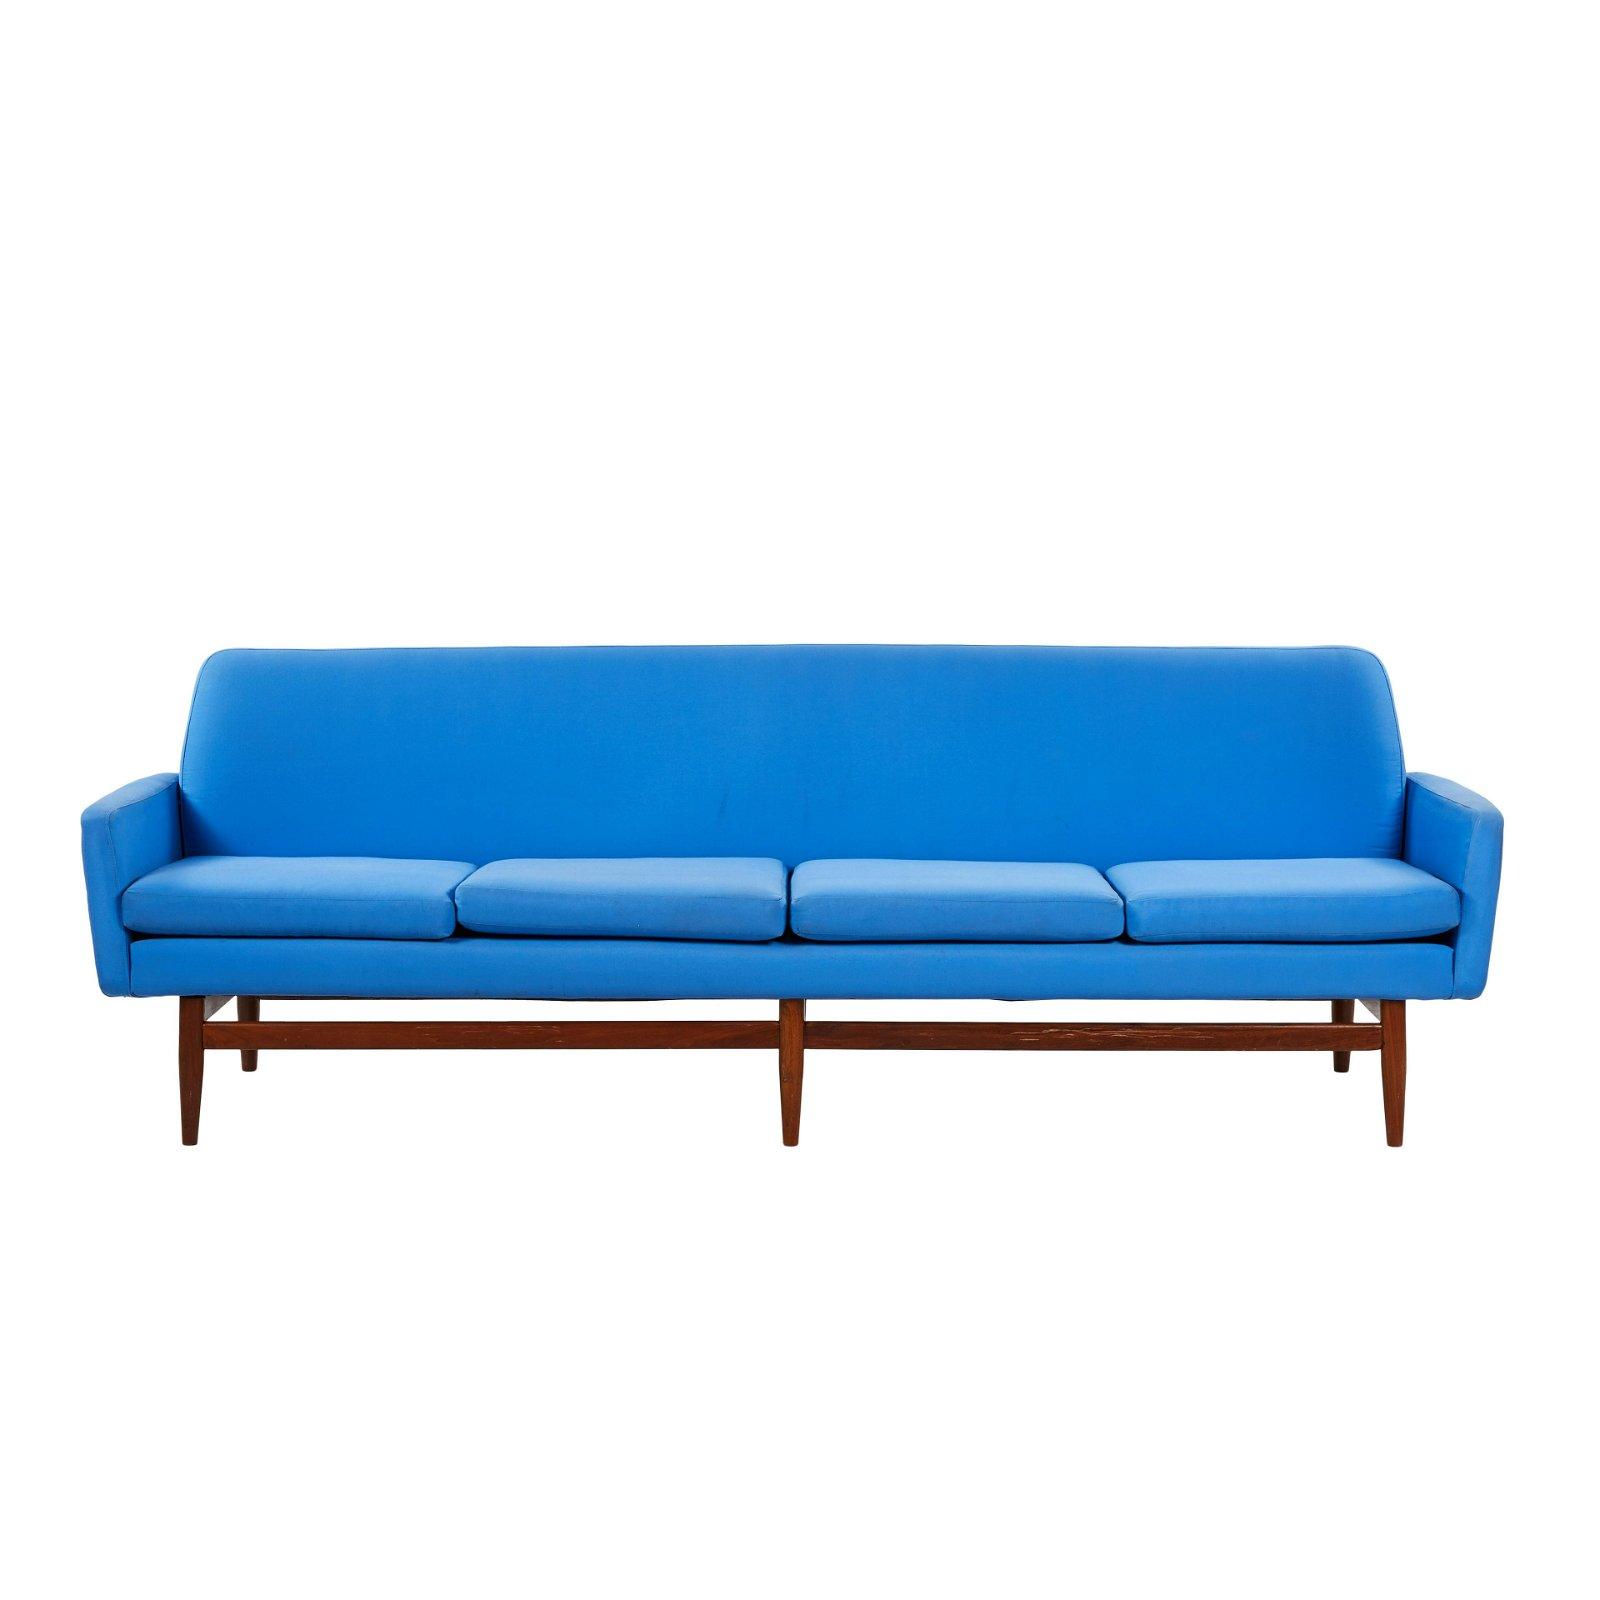 Folke Ohllson Sofa